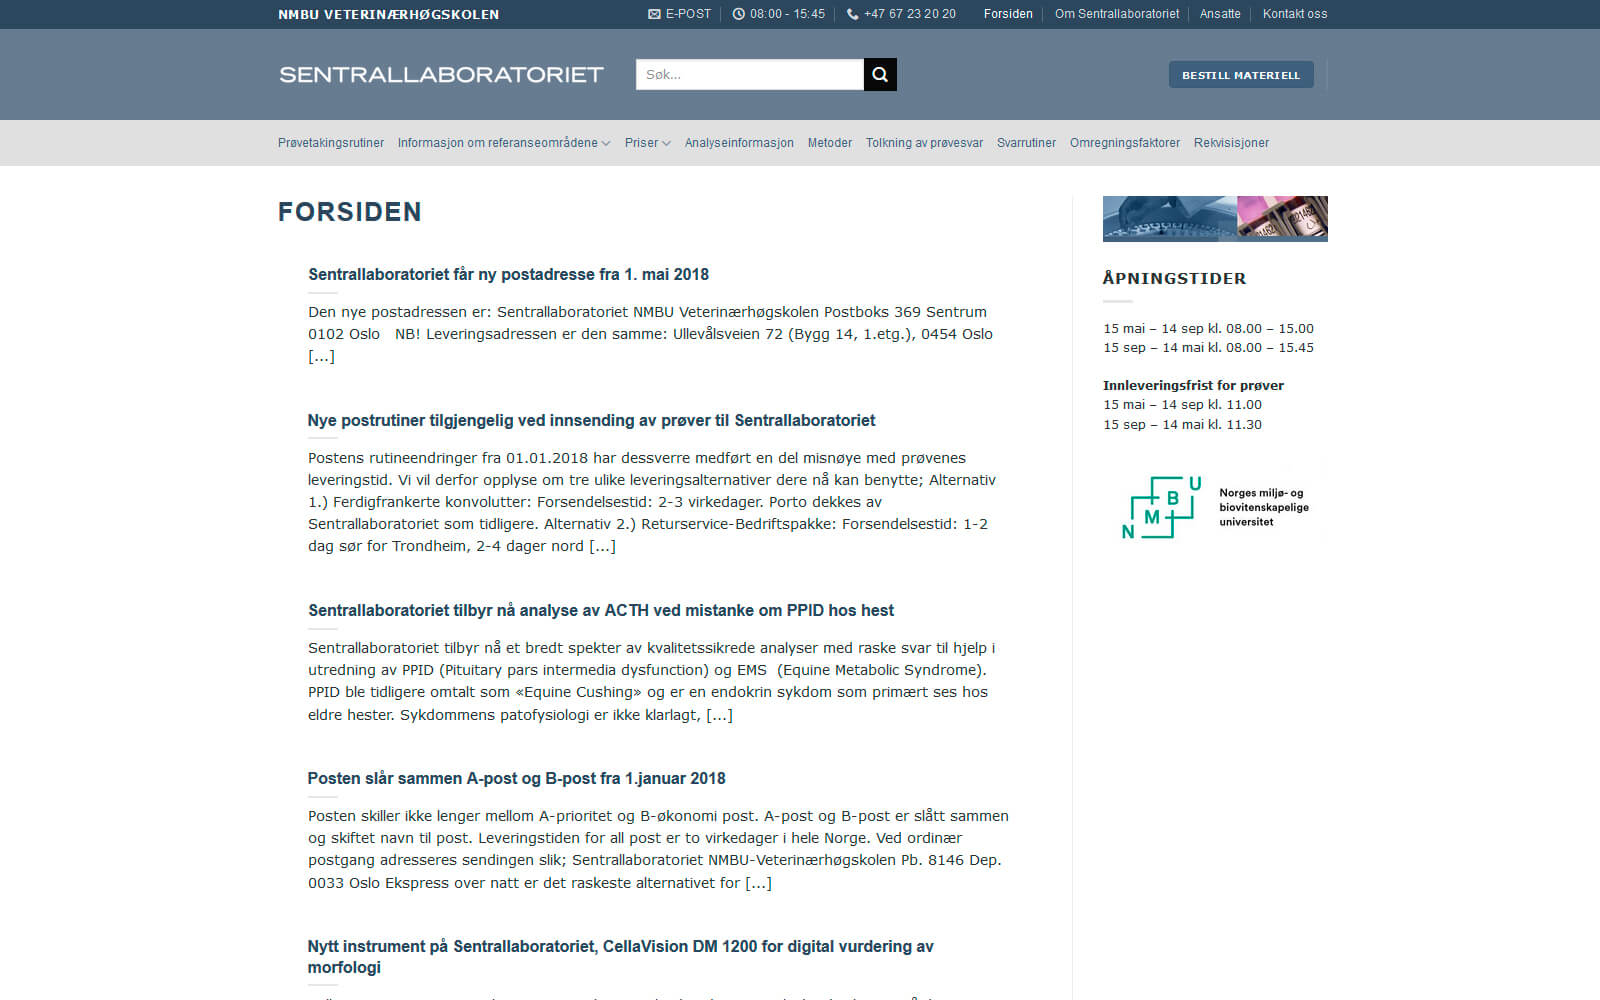 NMBU Veterinærhøgskolen Sentrallaboratoriet webside